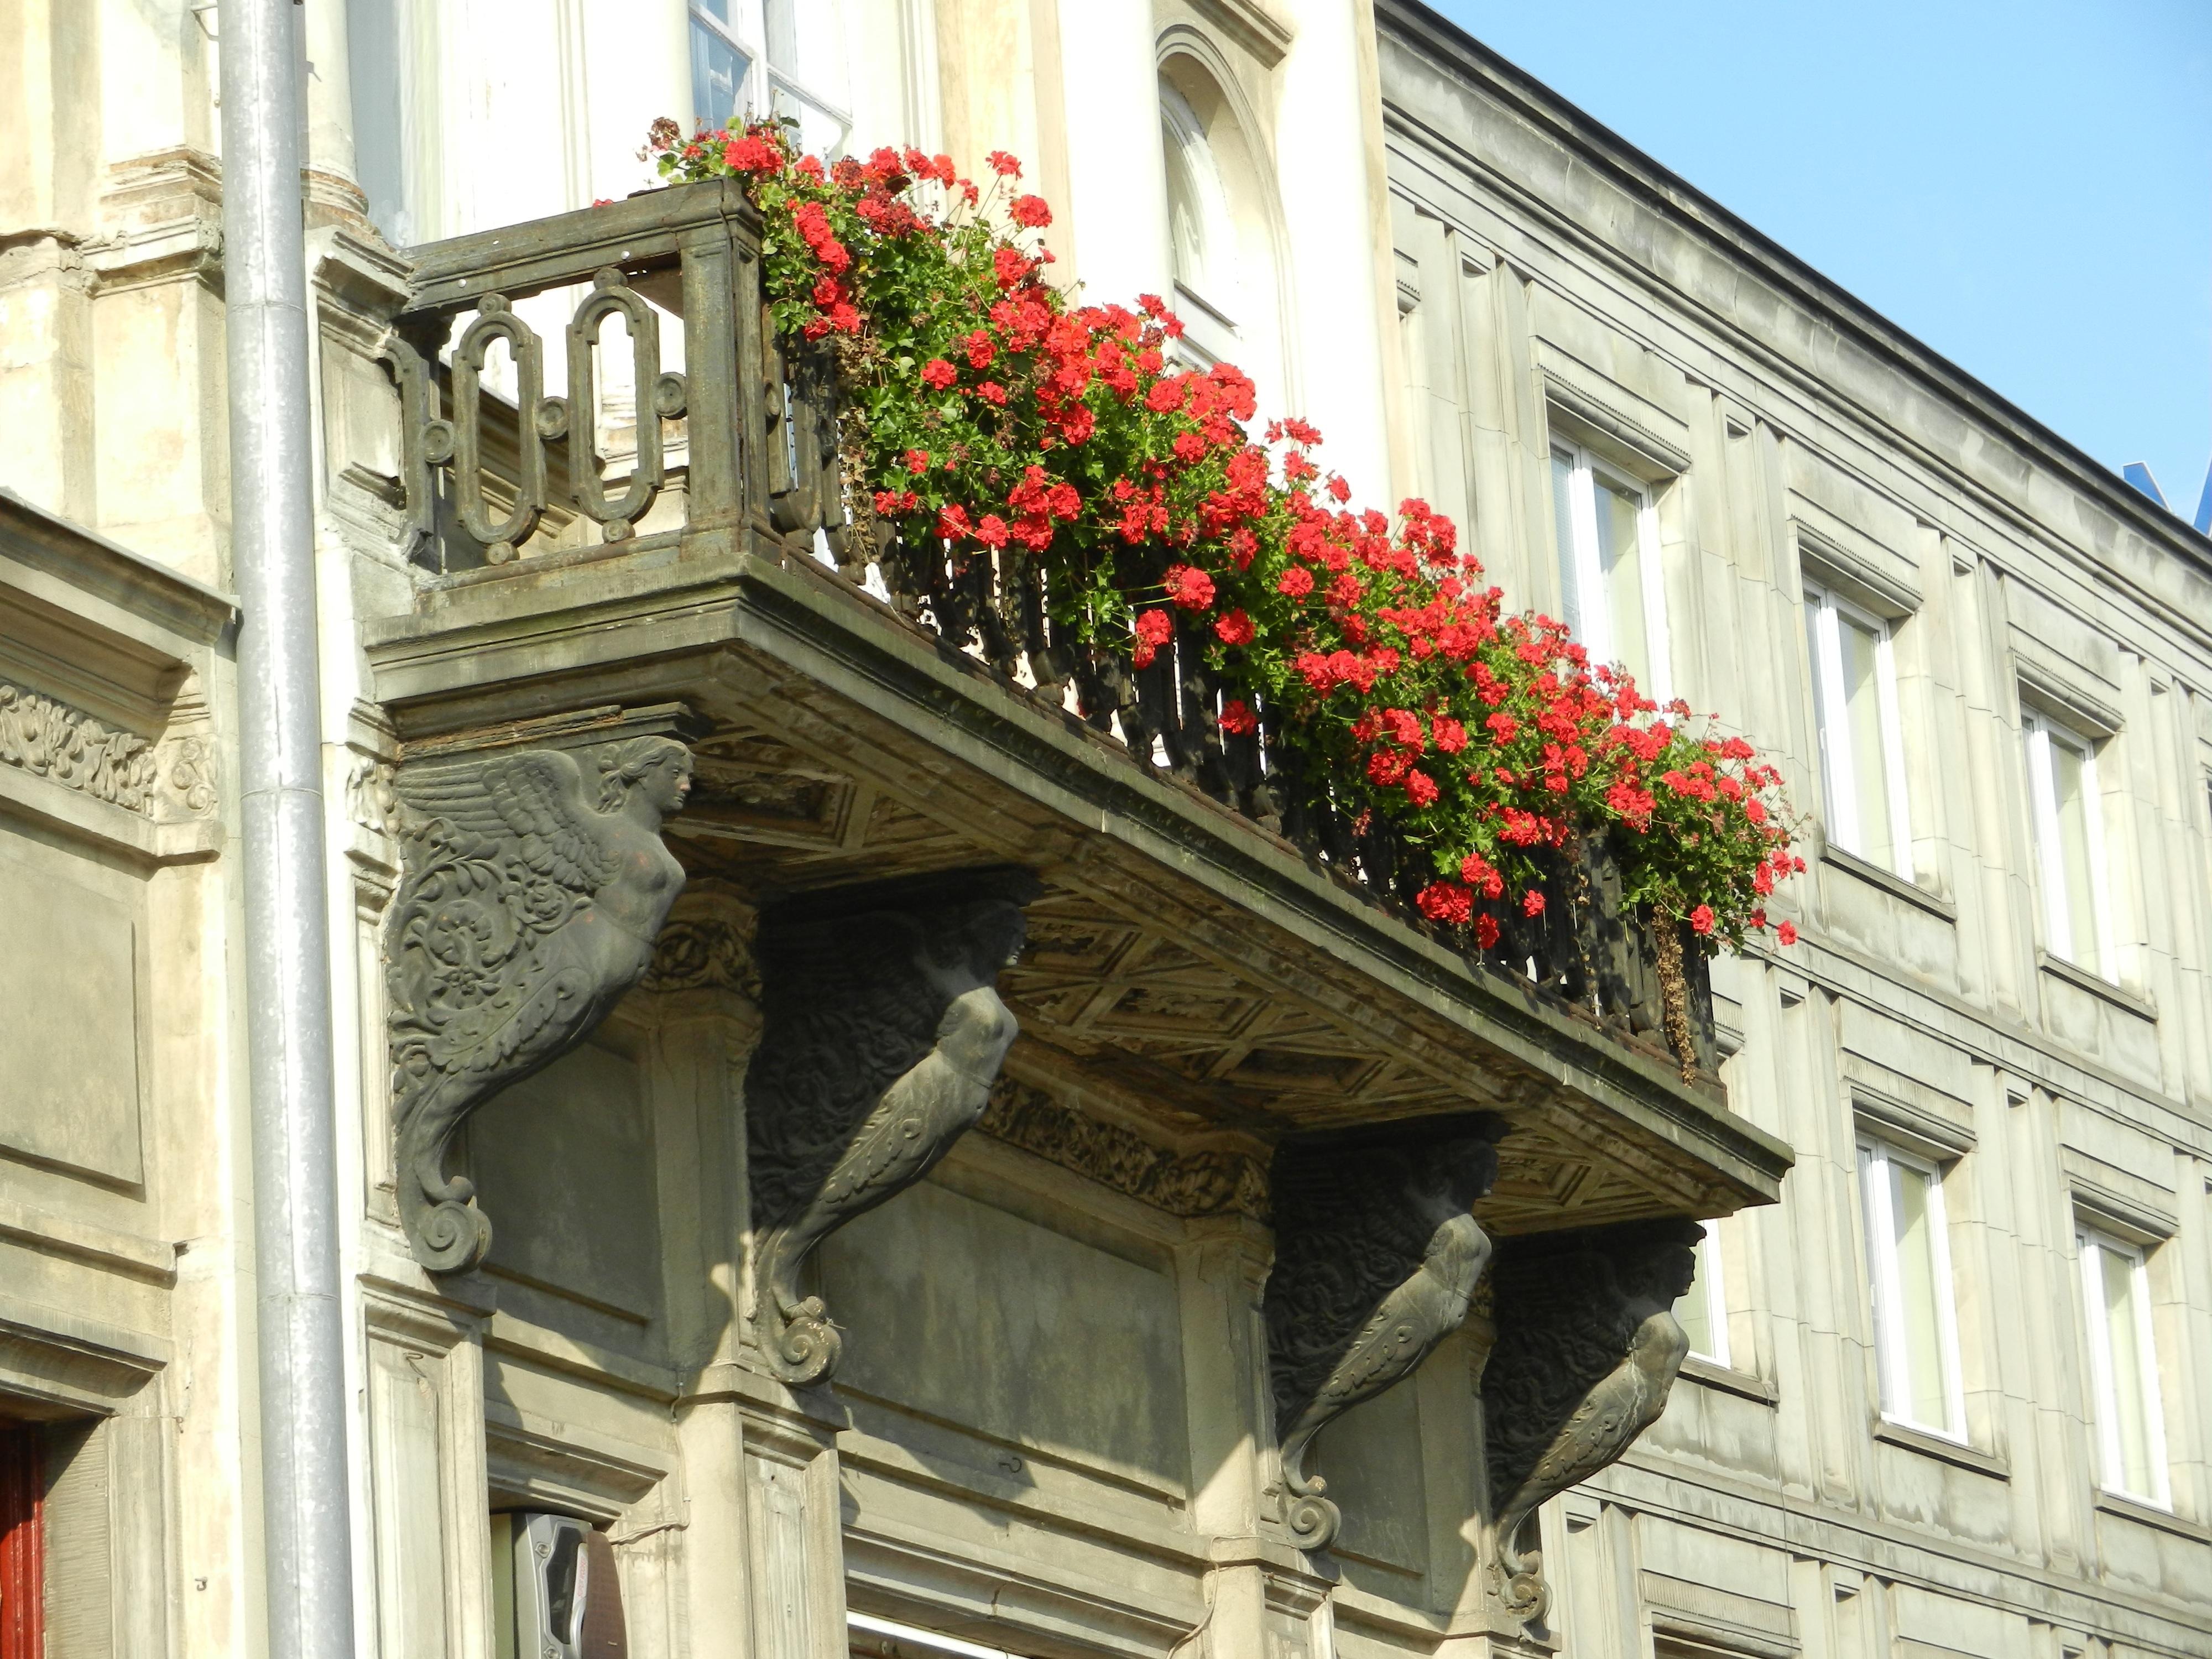 Картинки : архитектура, улица, дом, цветок, окно, здание, дв.